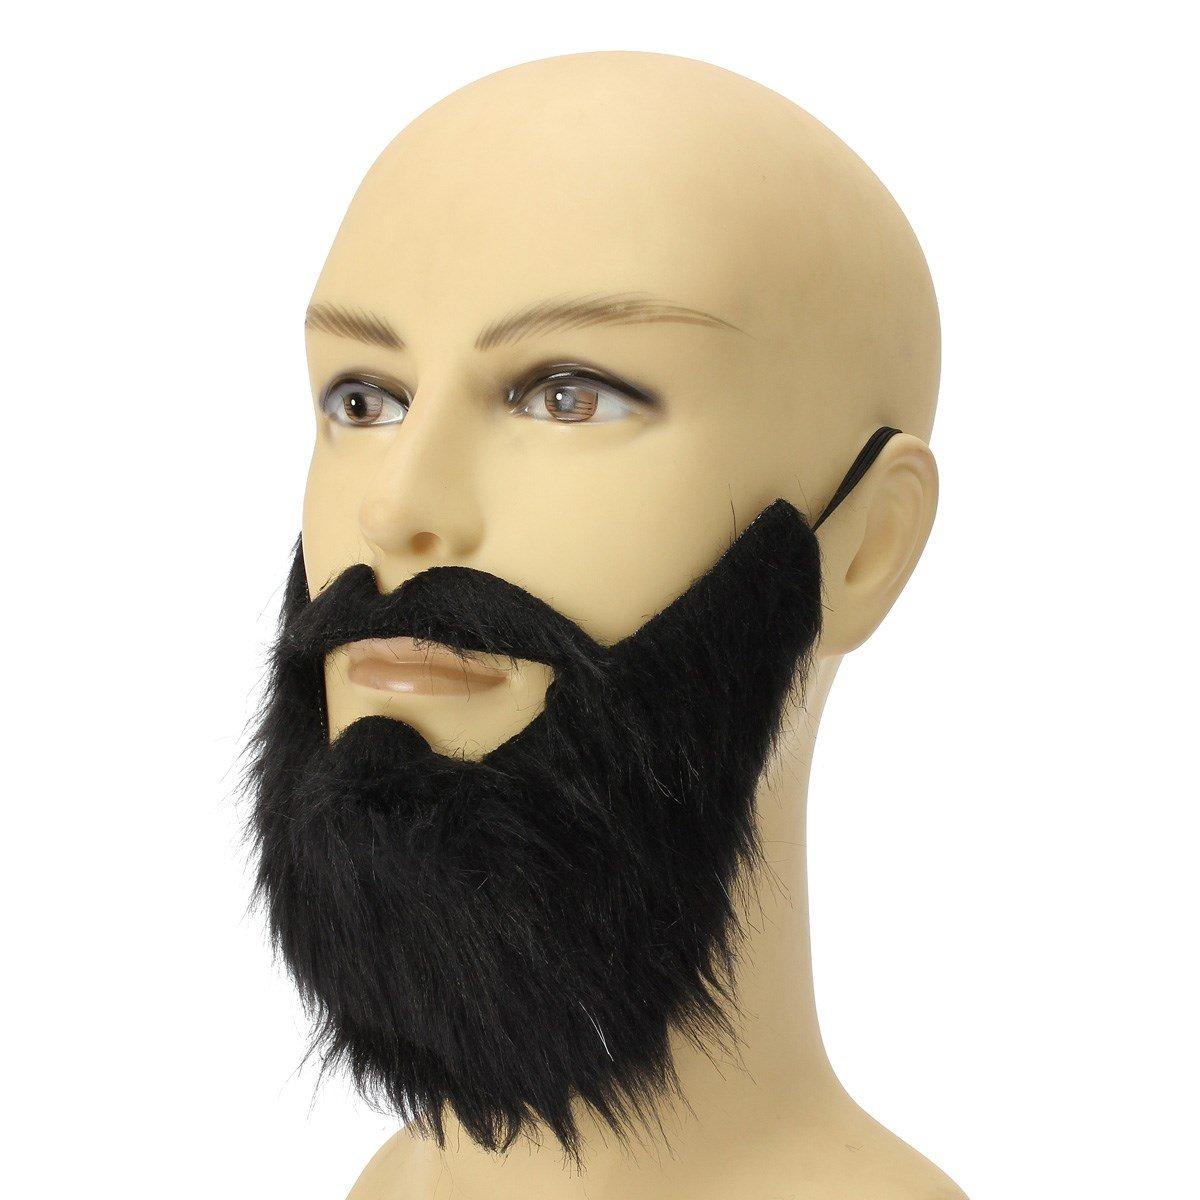 Yalulu Schwarz Bushy Falschen Bart, Karneval Fasching Halloween Falscher Bart Schurrbart Mustache